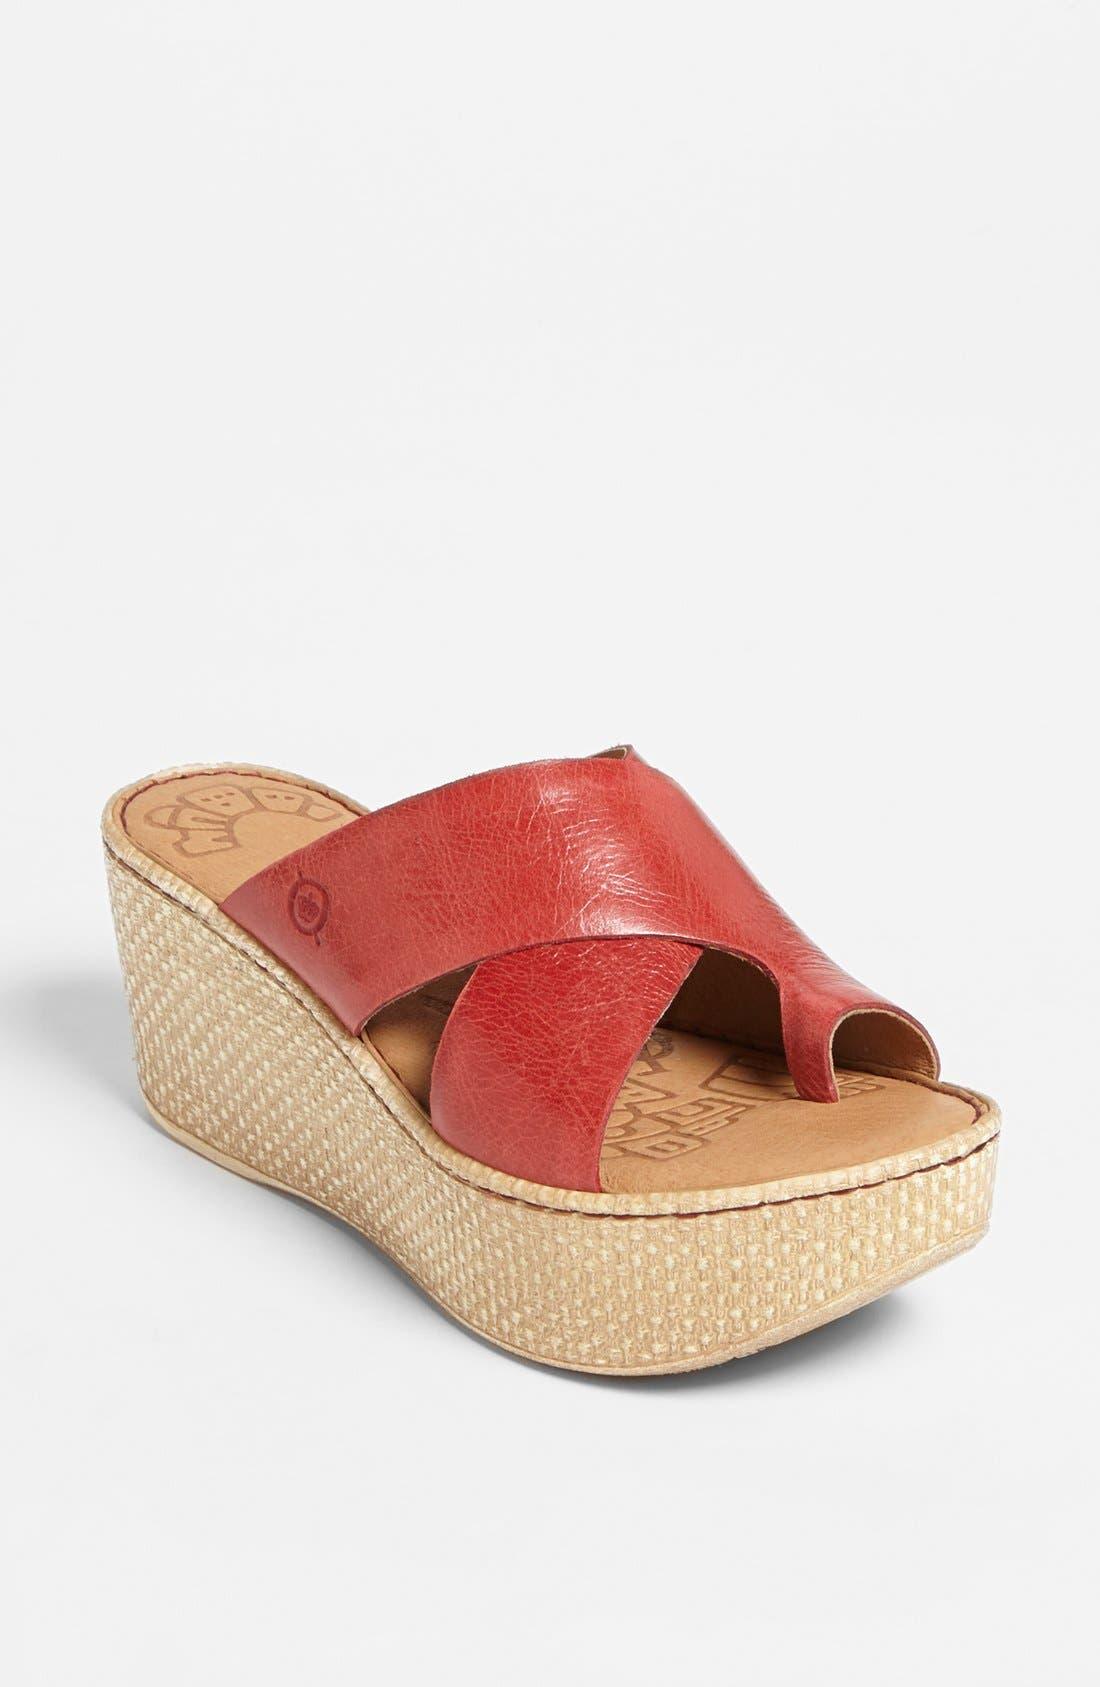 Alternate Image 1 Selected - Børn 'Shelene' Sandal (Special Purchase)